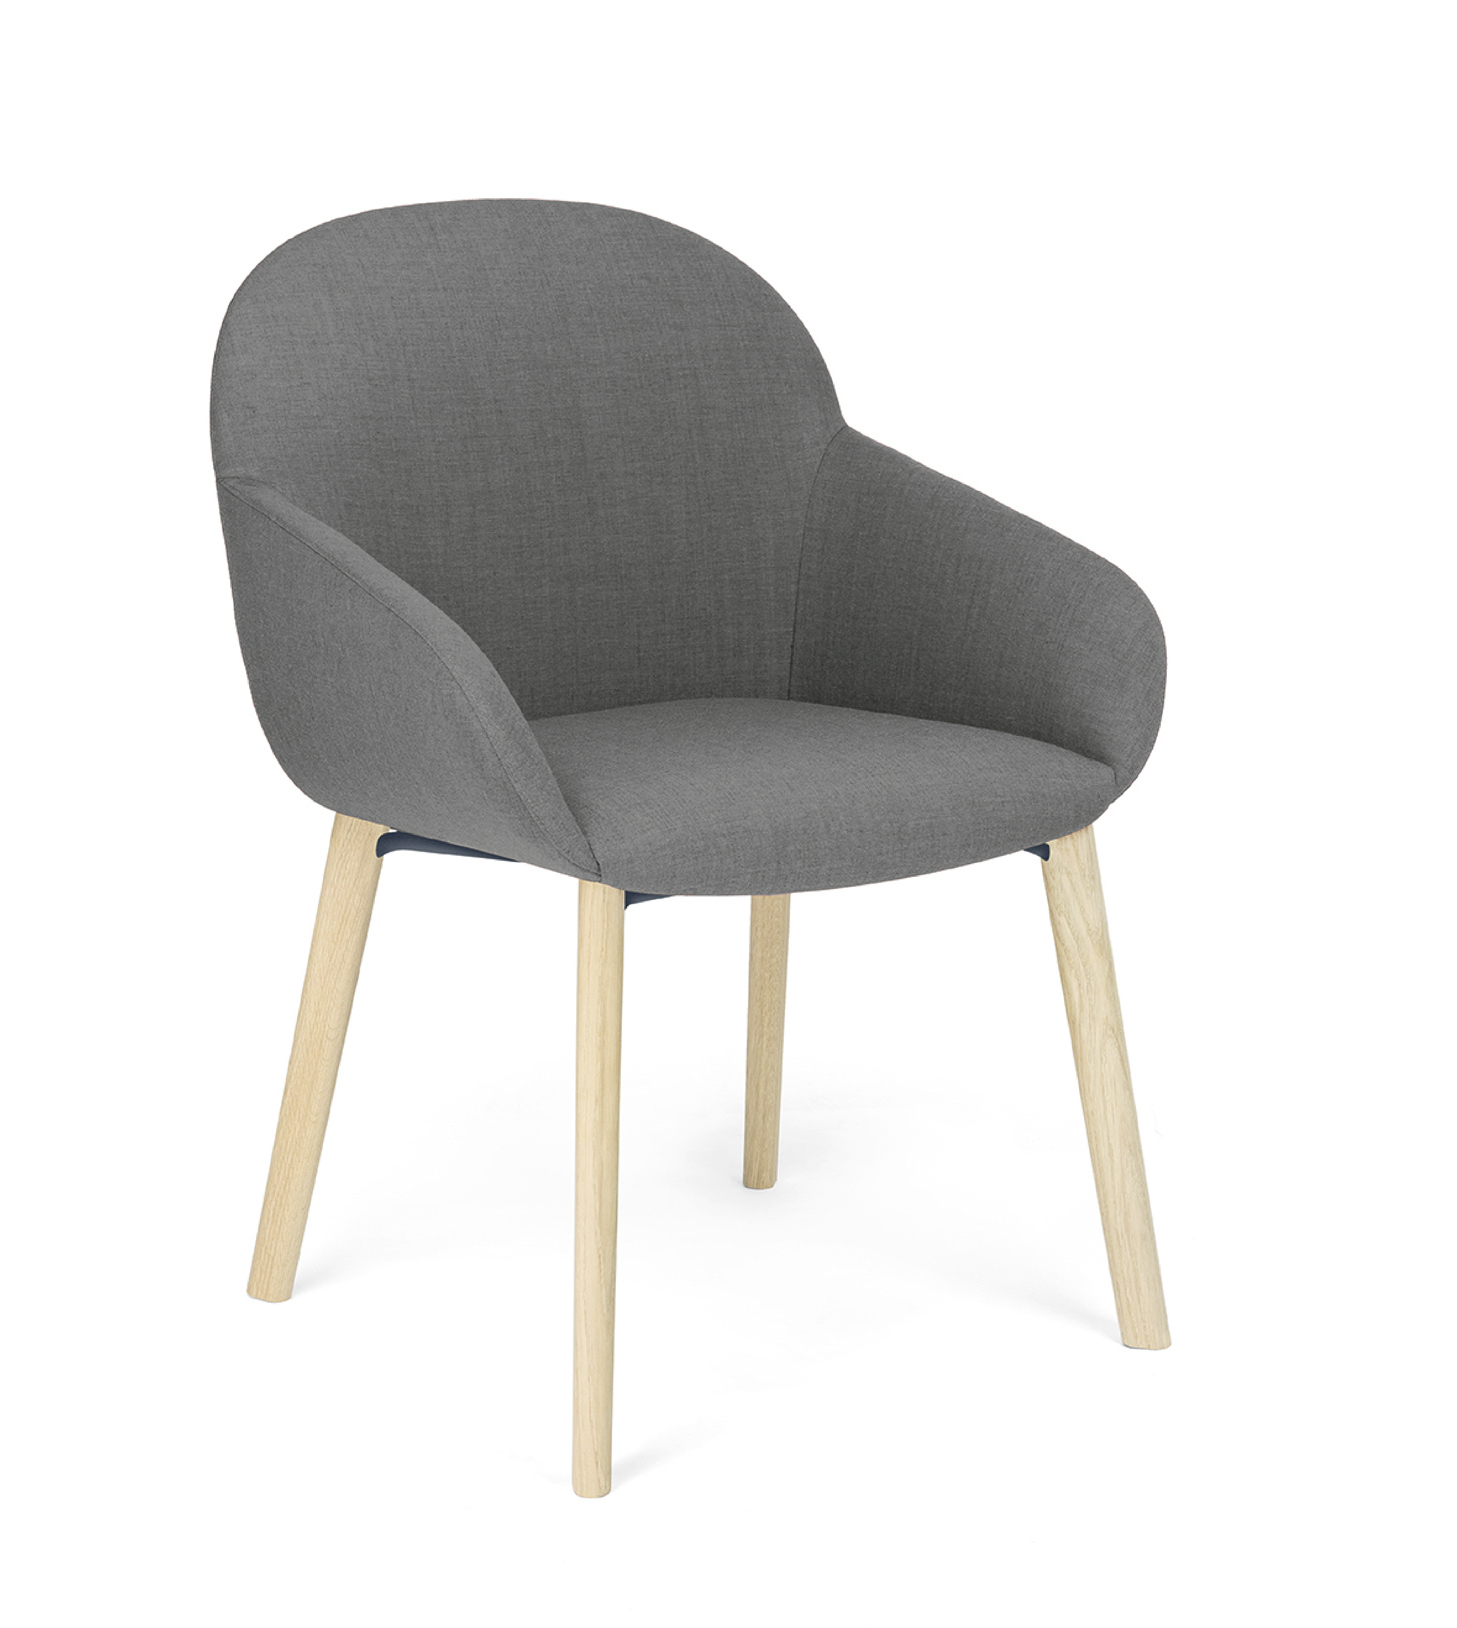 Elba chair designed by Debiasi Sandri for Crassevig with wooden legs